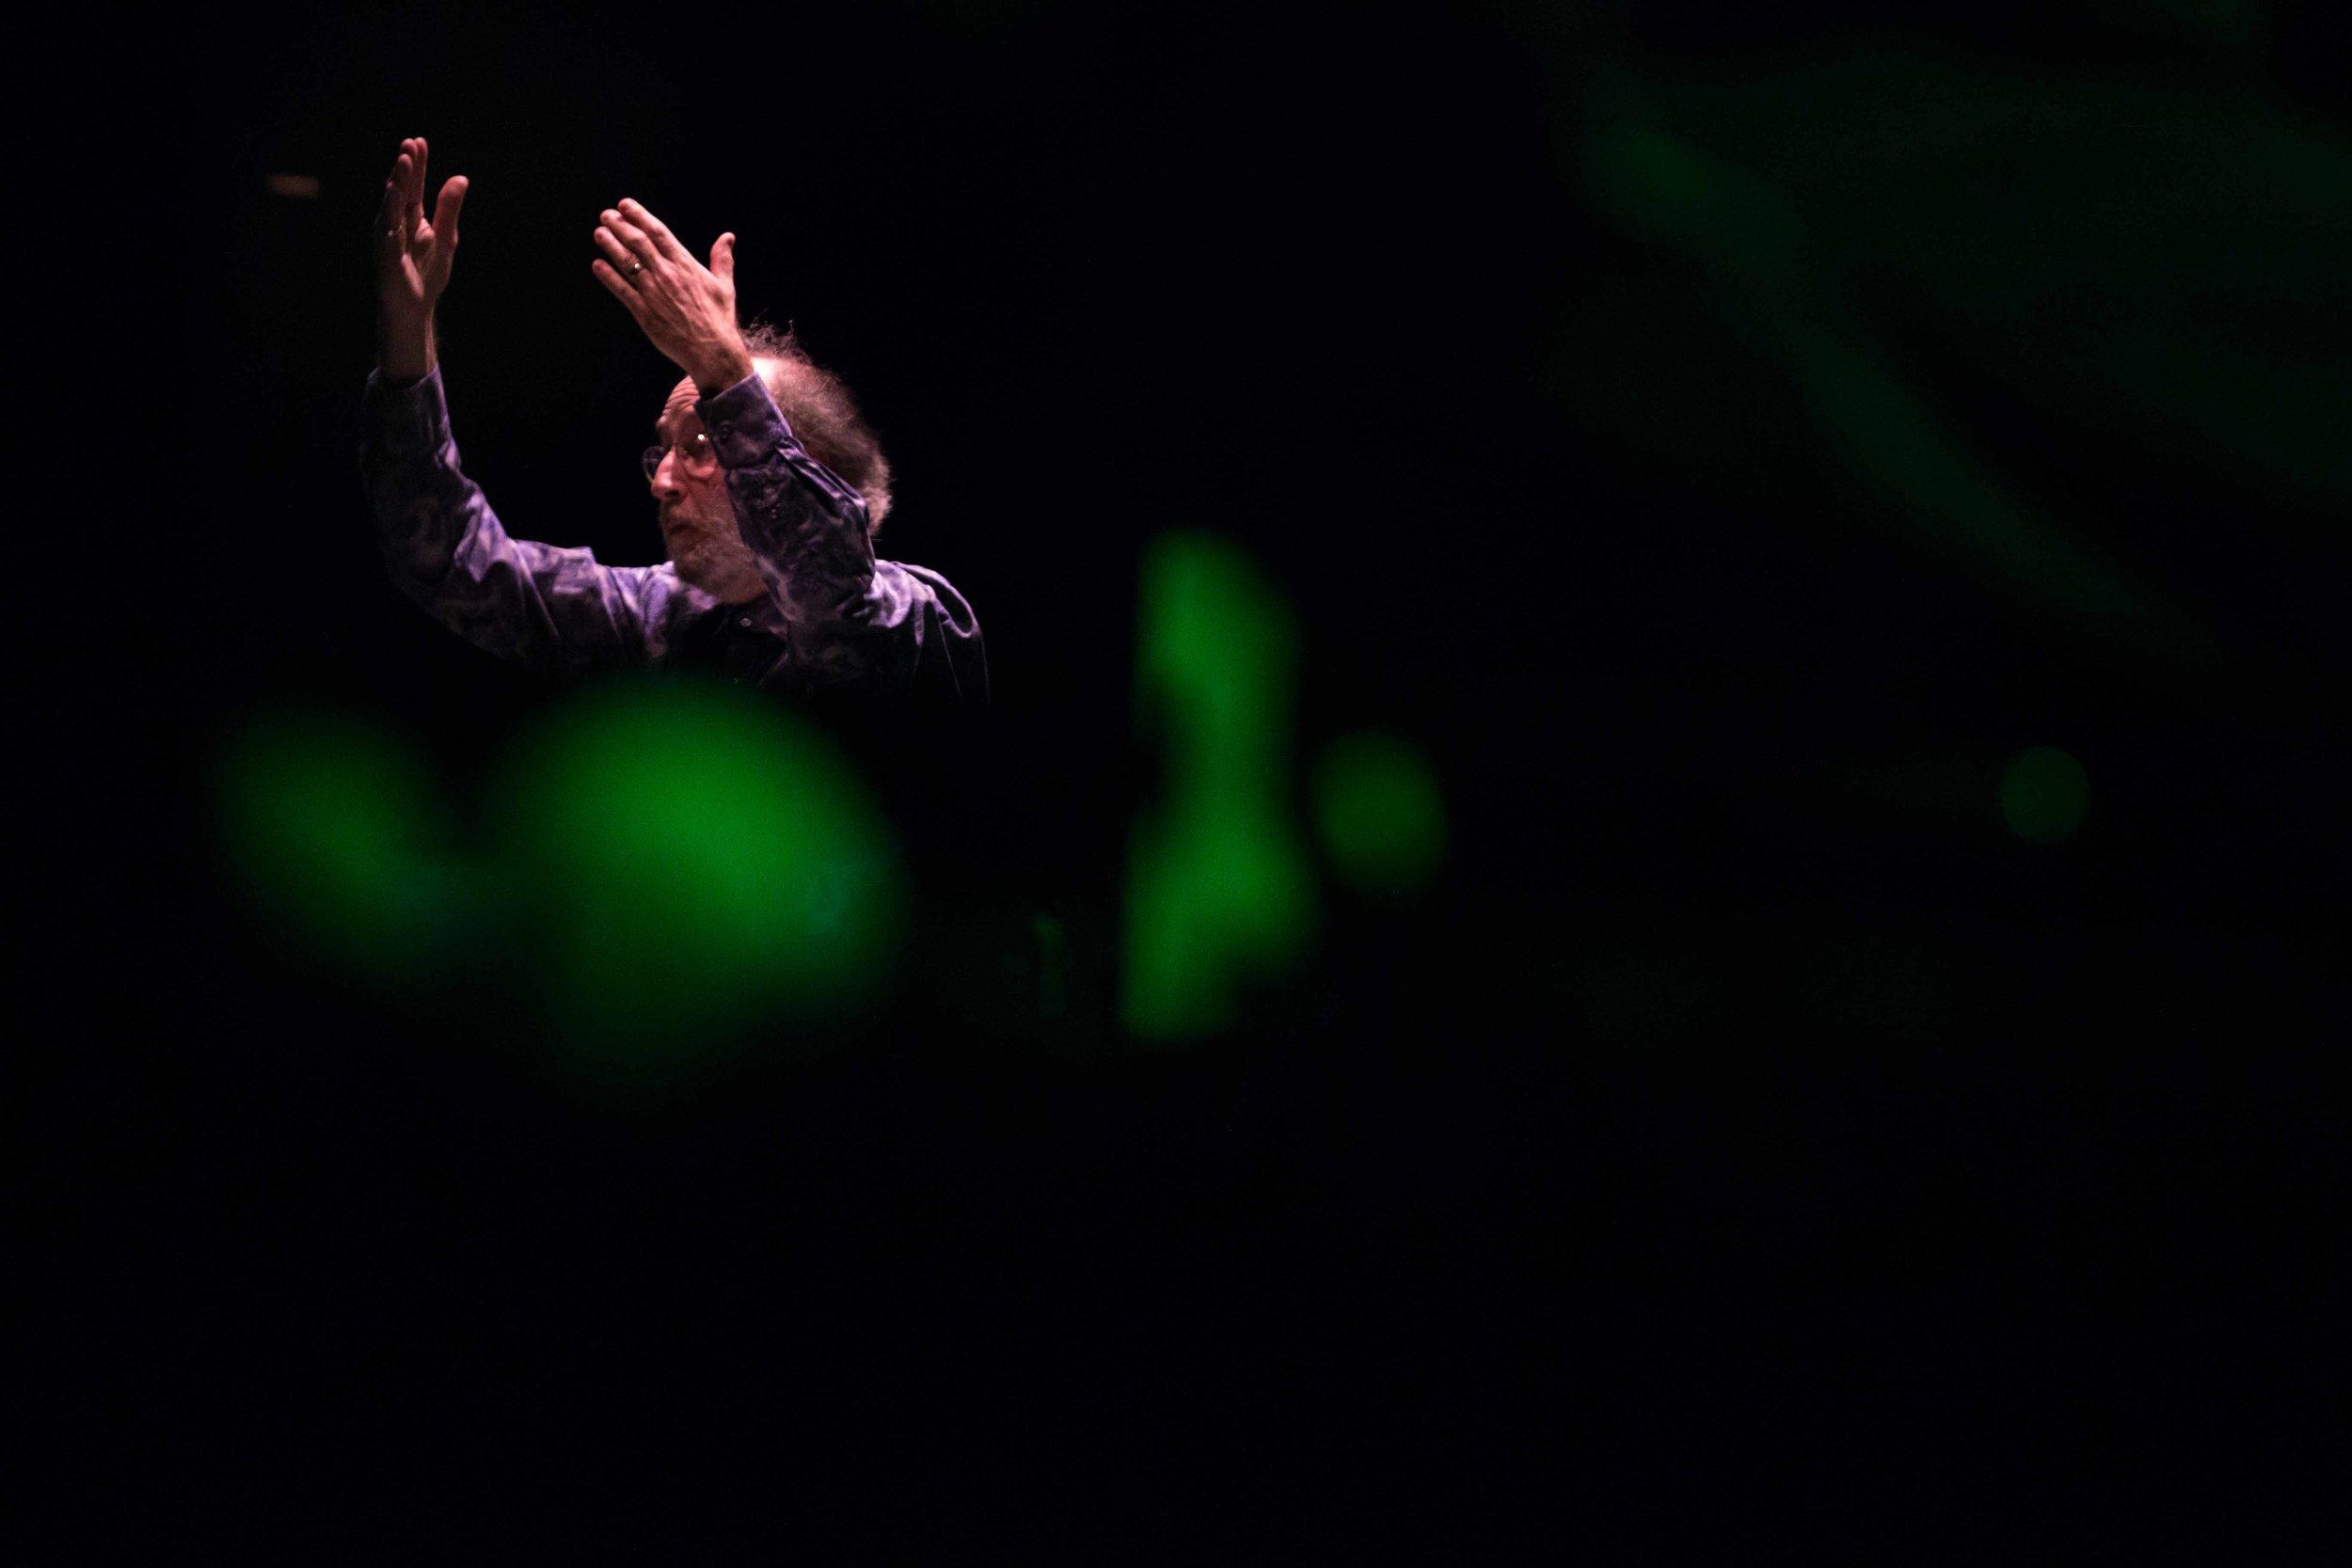 Saman-Shariati-Plastic-Acid-Orchestra-Veda-Hille-11.jpg